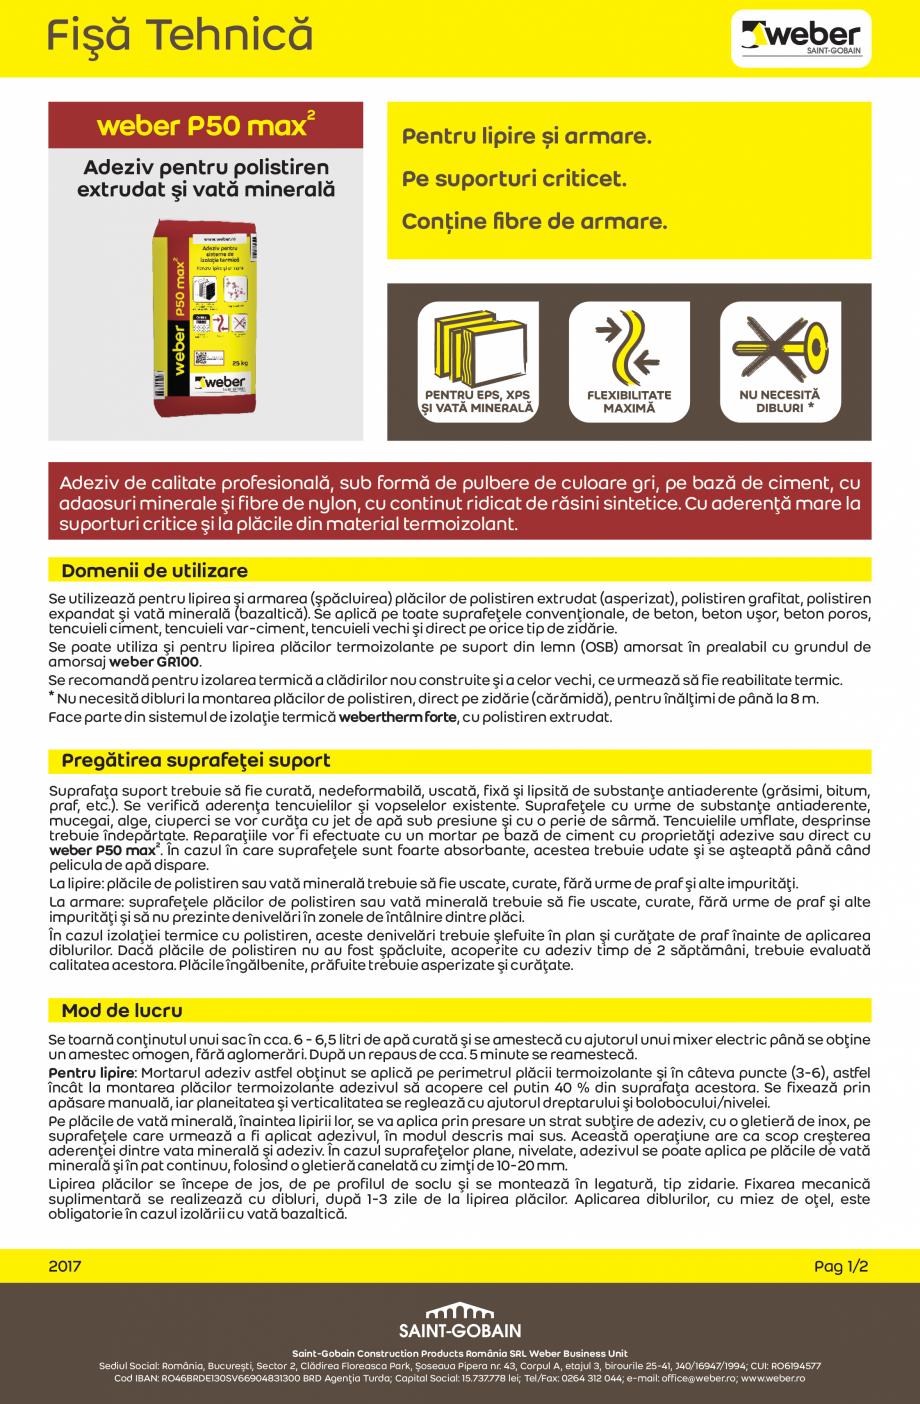 Pagina 1 - Adeziv flexibil pentru polistiren expandat si vata minerala WEBER weber P50 max2 Fisa...